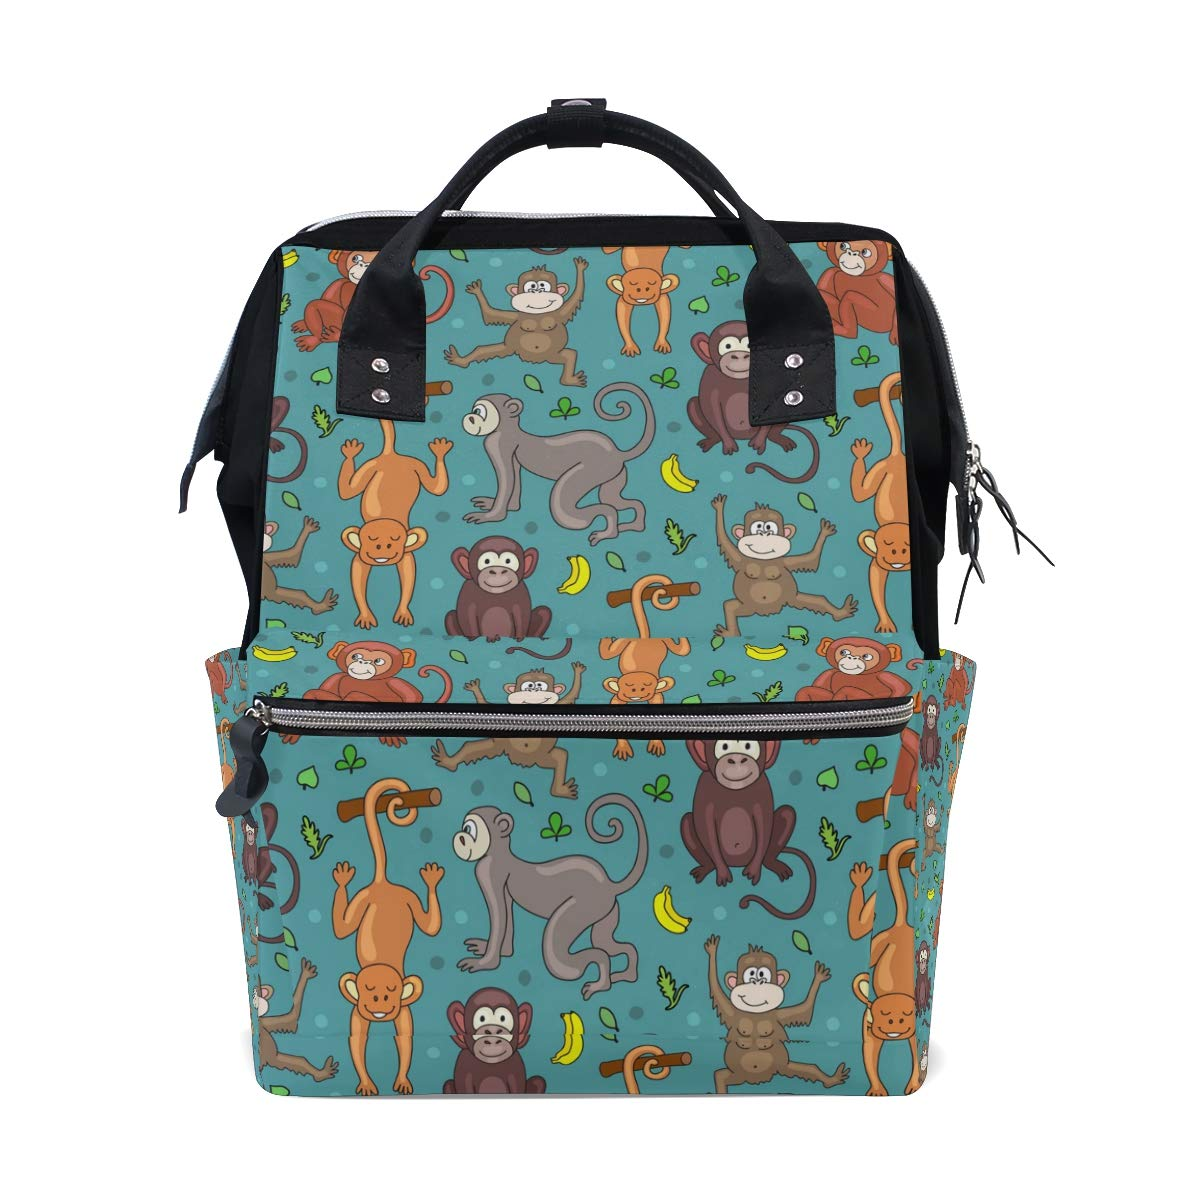 MERRYSUGAR Mommy Bag Diaper Bag Baby Bag School Backpack Monkey Green Banana Large Multifunction Travel Bag Mommy Bag